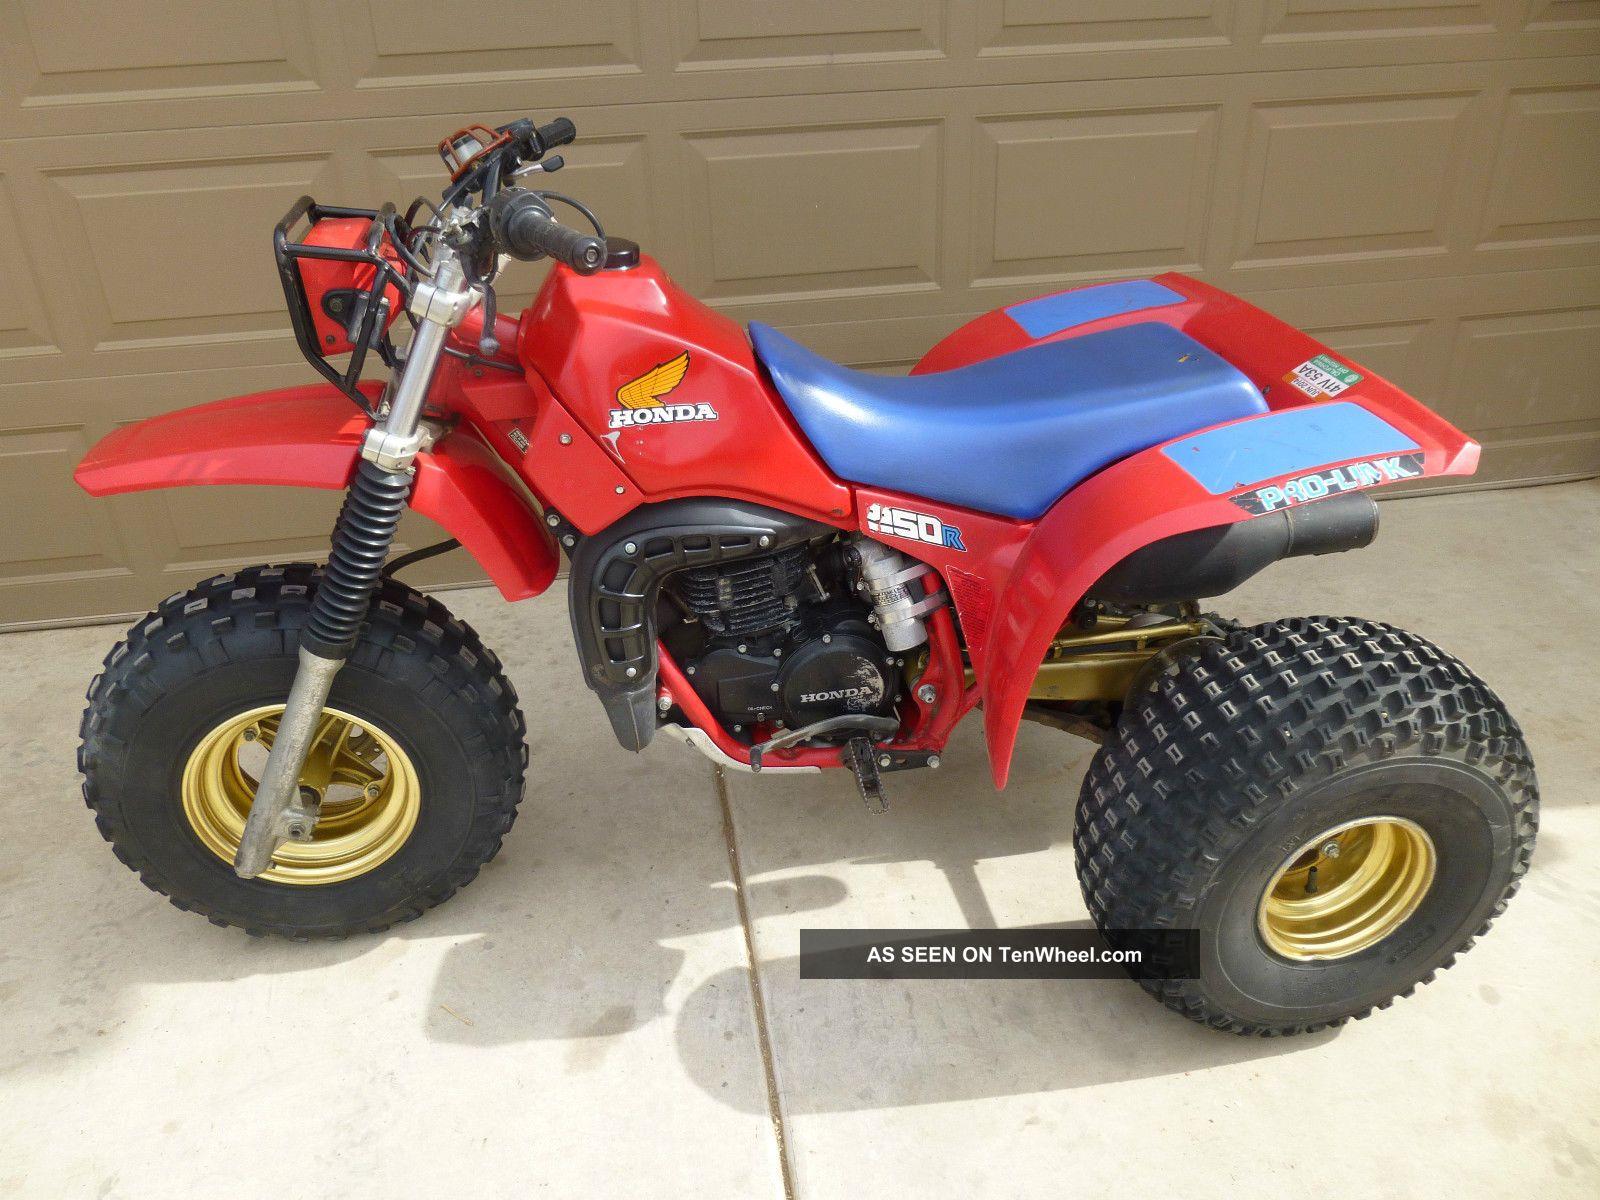 1984 Honda Atc250r Honda photo